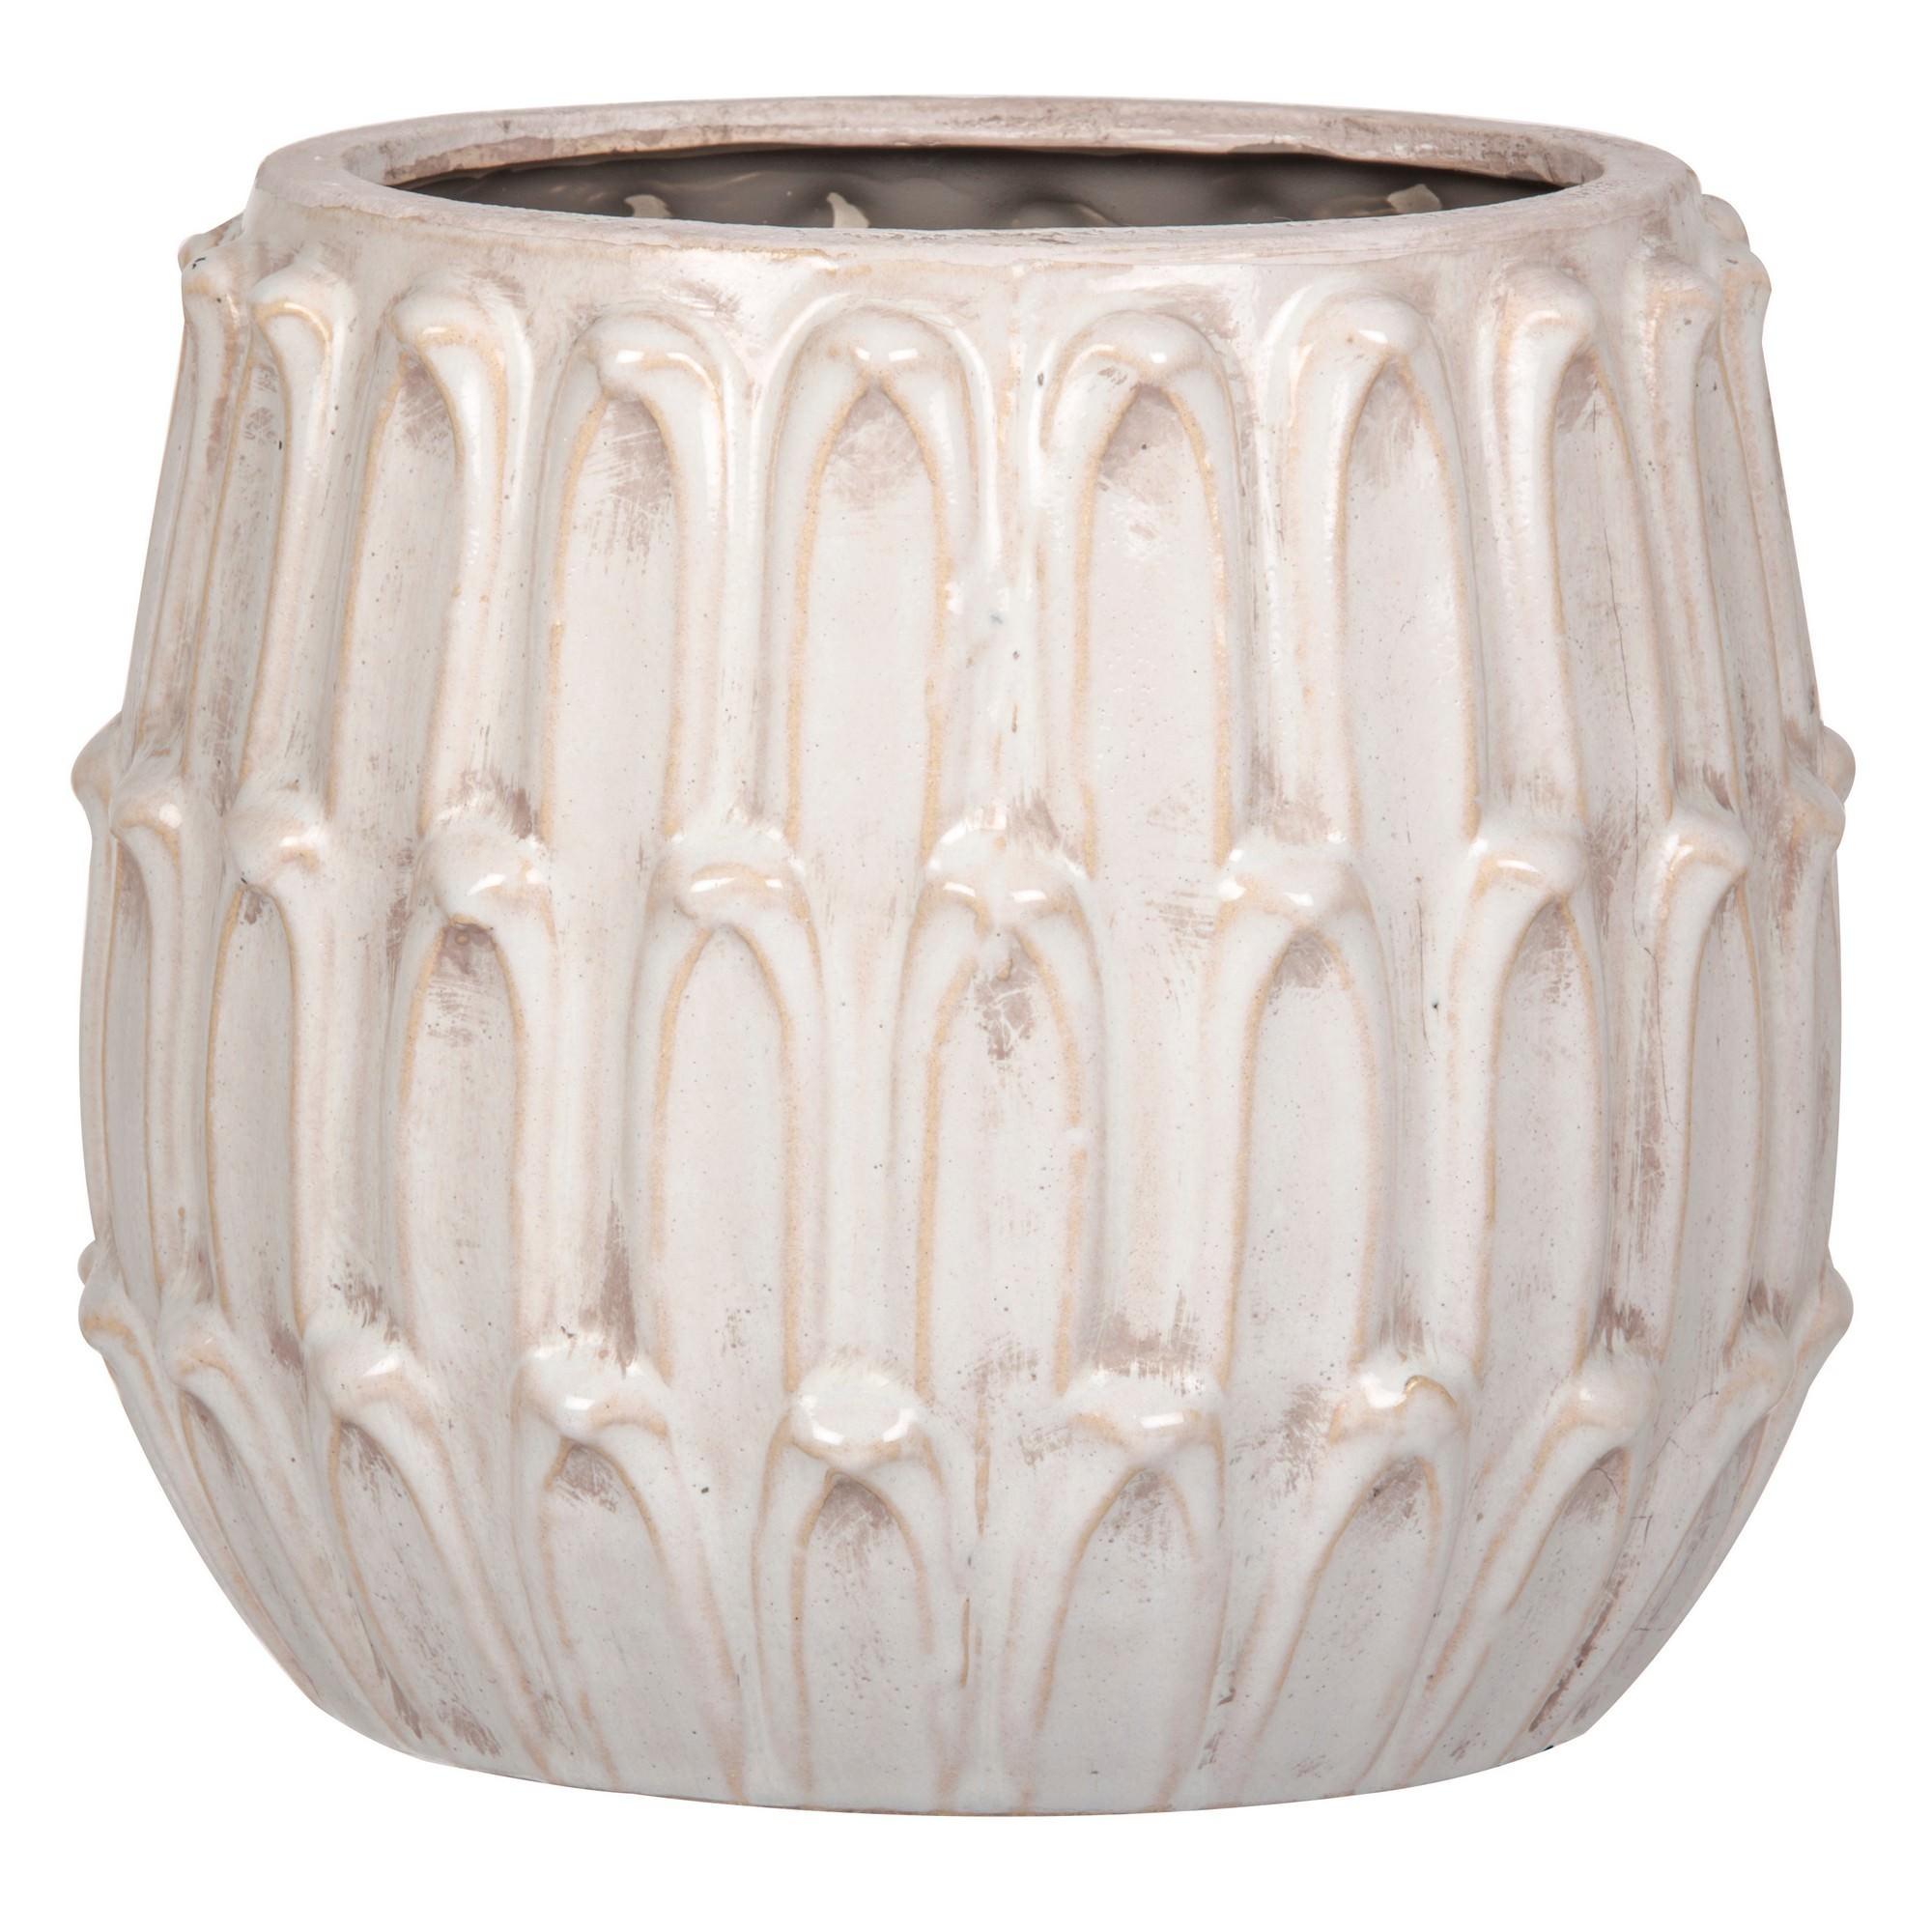 Marley Ceramic Pot